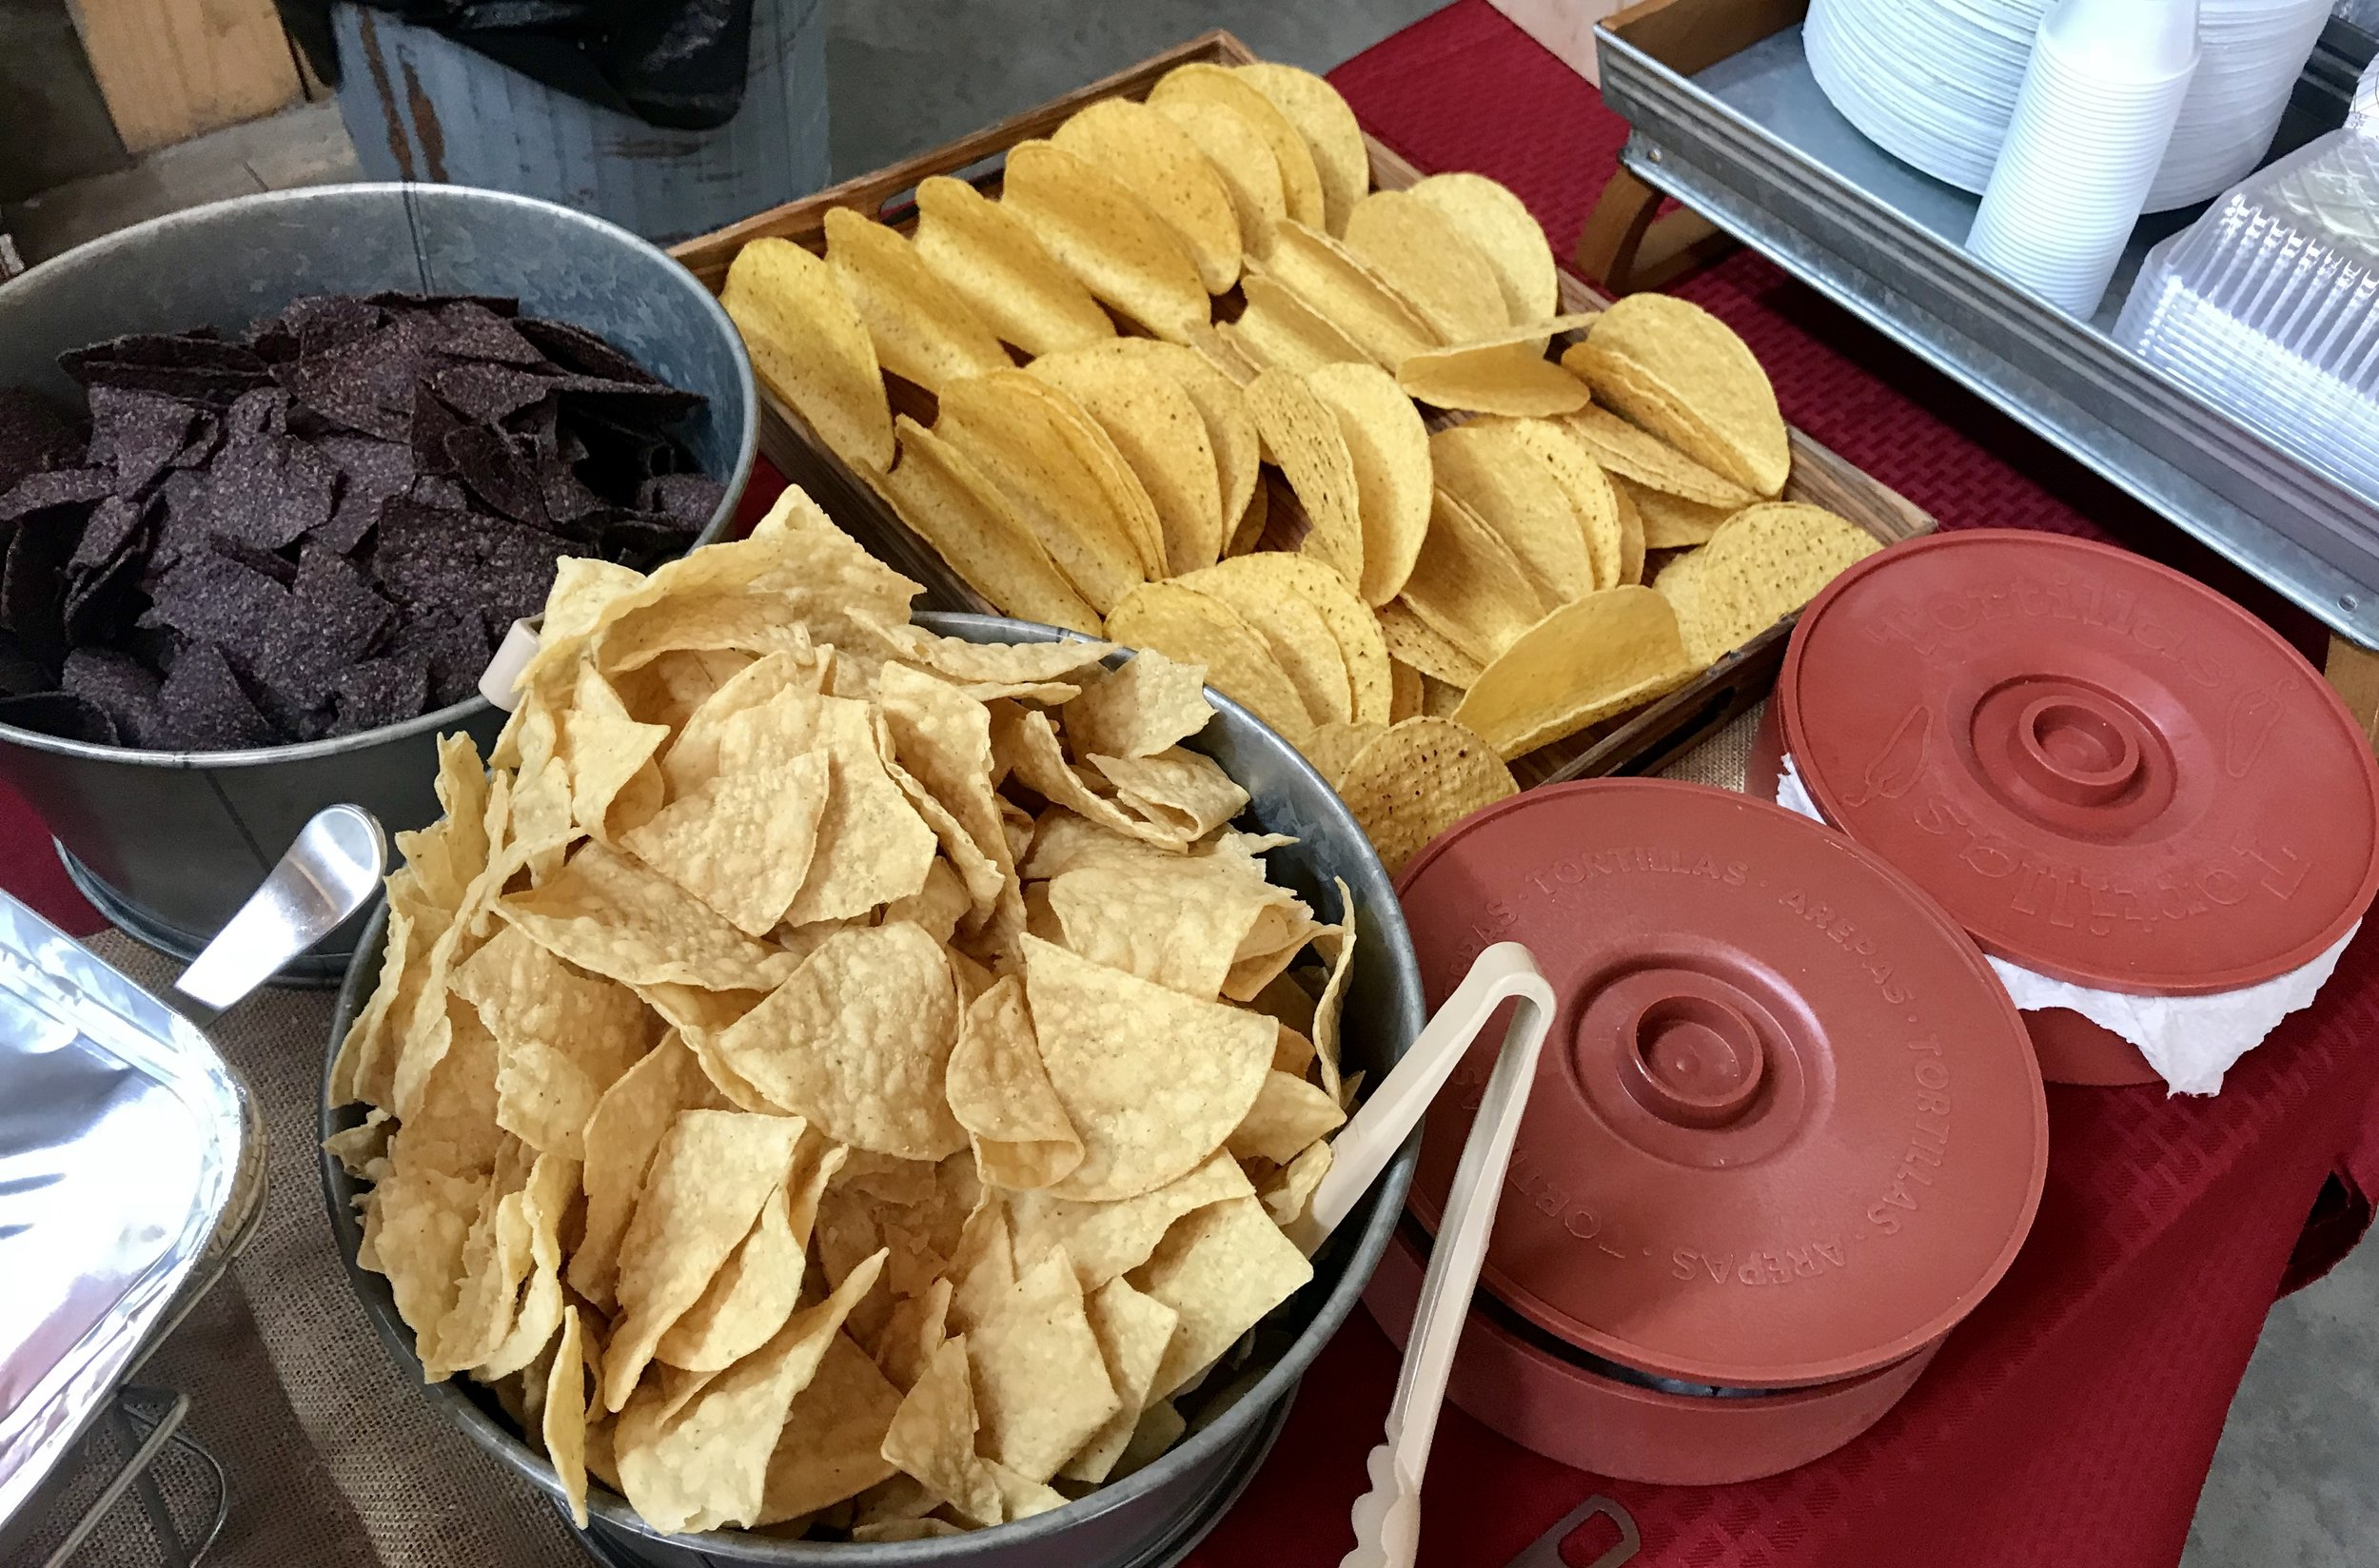 Variety of Nacho Chips, Taco Shells & Corn/Flour Tortilla Wraps!